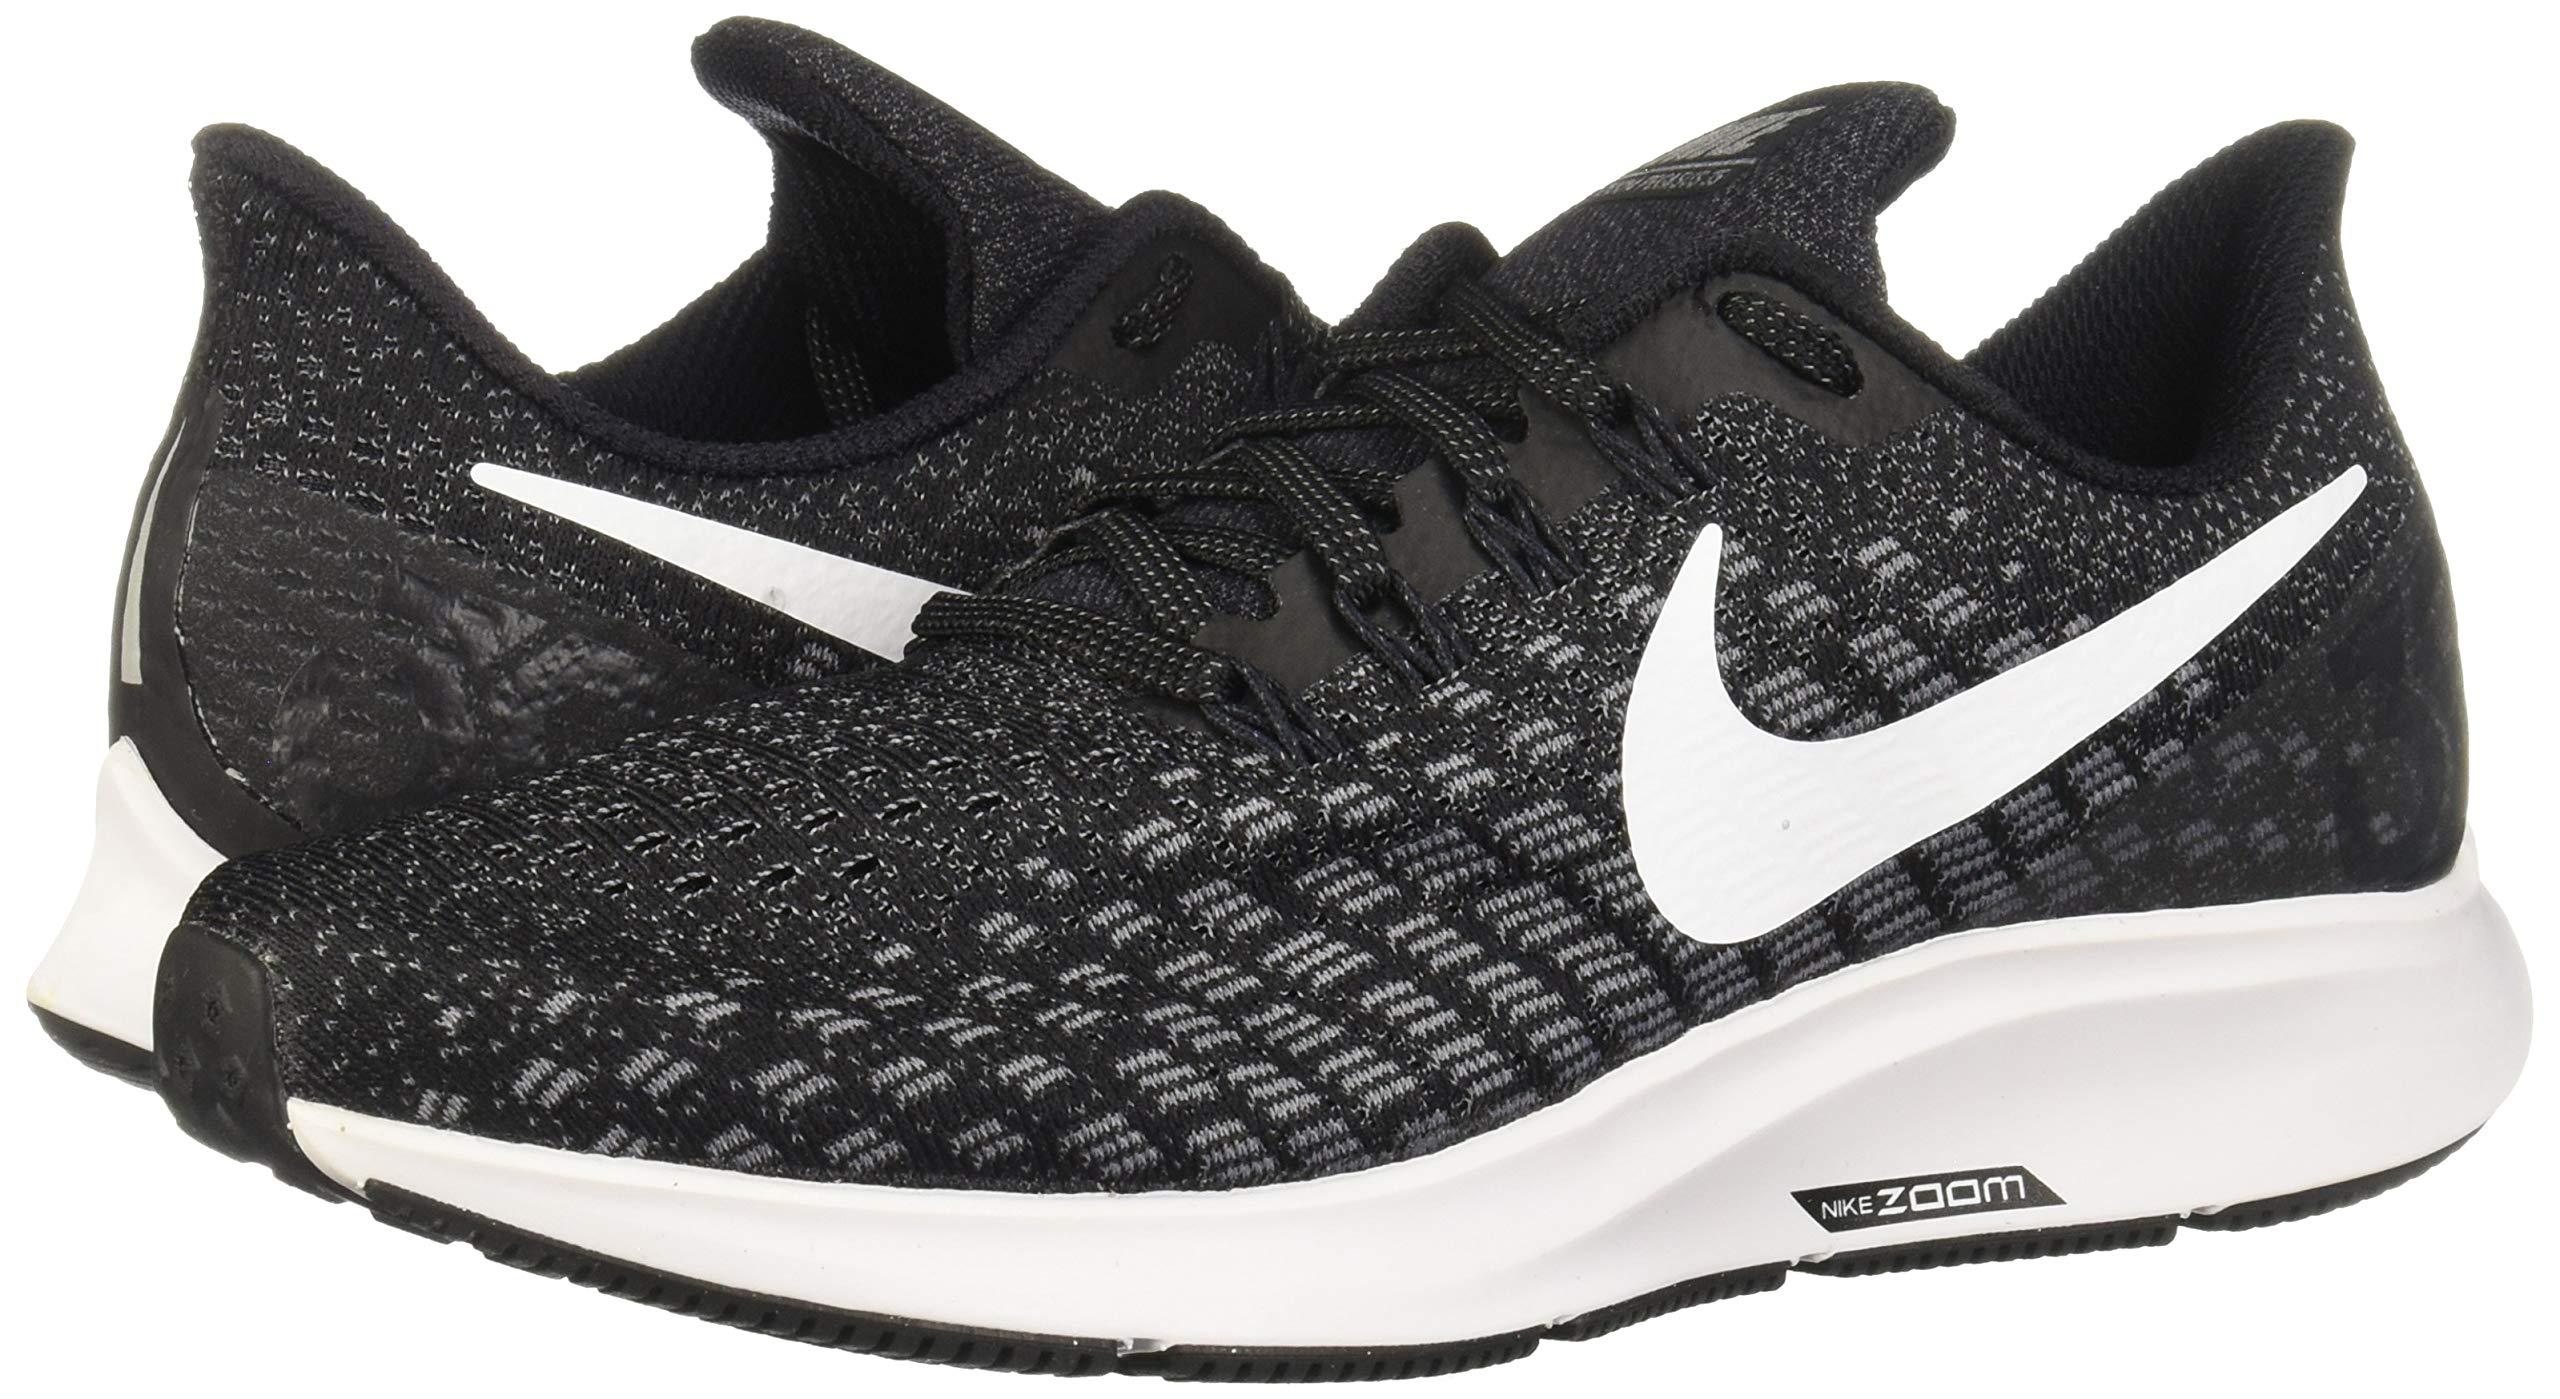 Nike Shox Current Gs Women's Running Shoe (5, Black/Black) by Nike (Image #5)